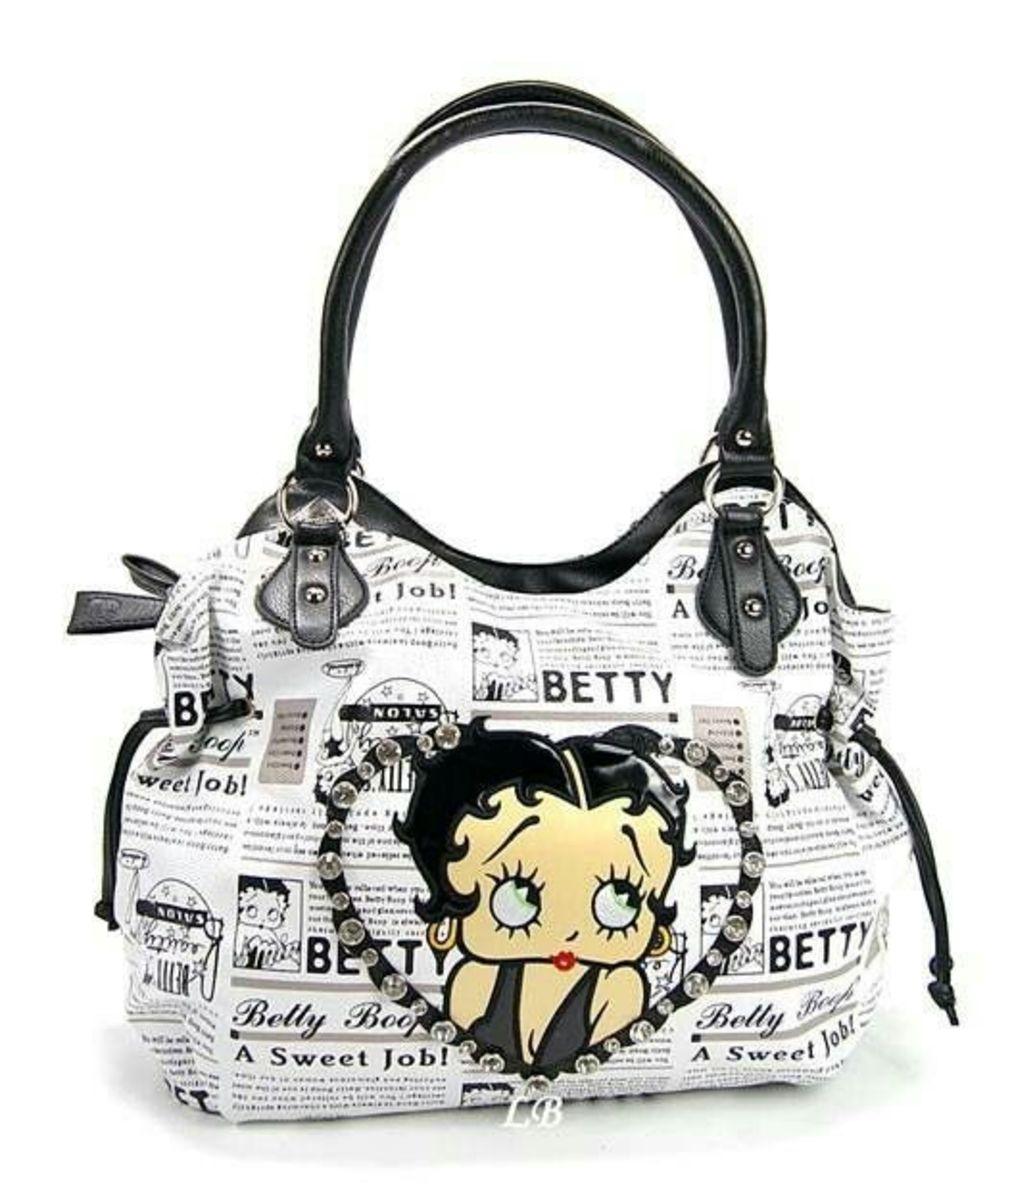 betty-boop-handbags